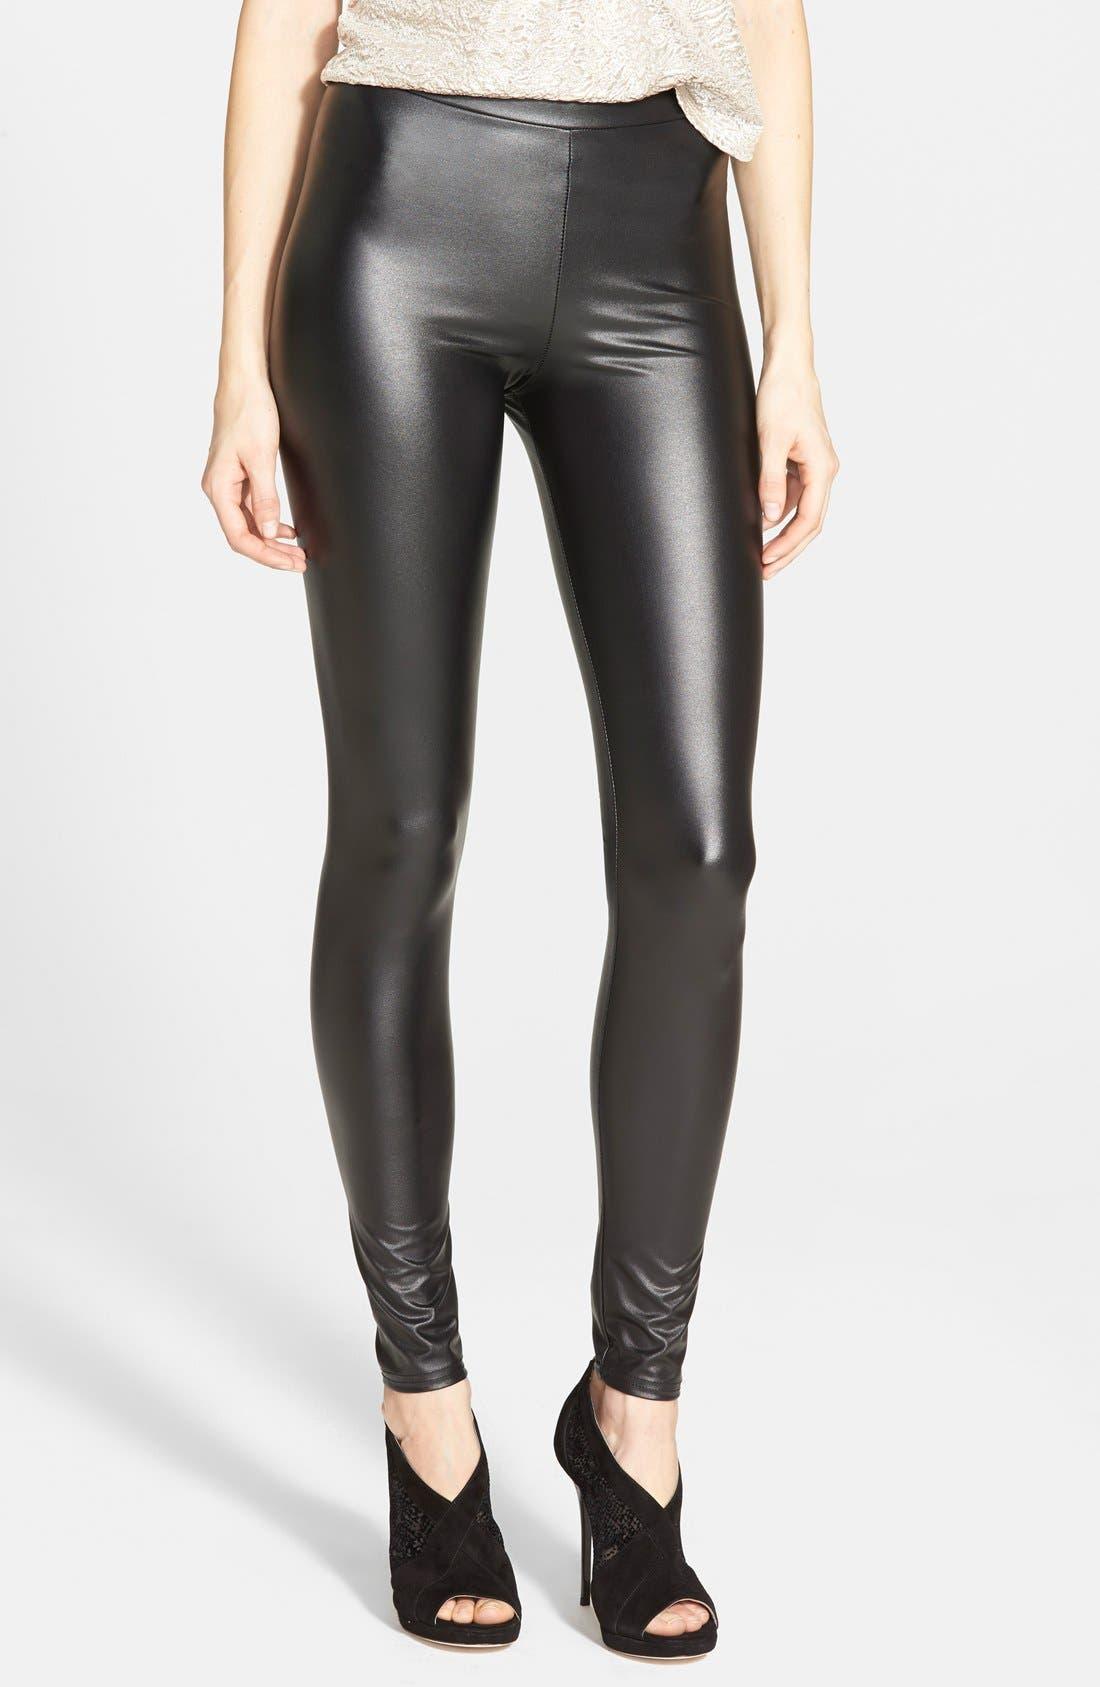 Alternate Image 1 Selected - Topshop Textured Wet Look Leggings (Regular & Petite)